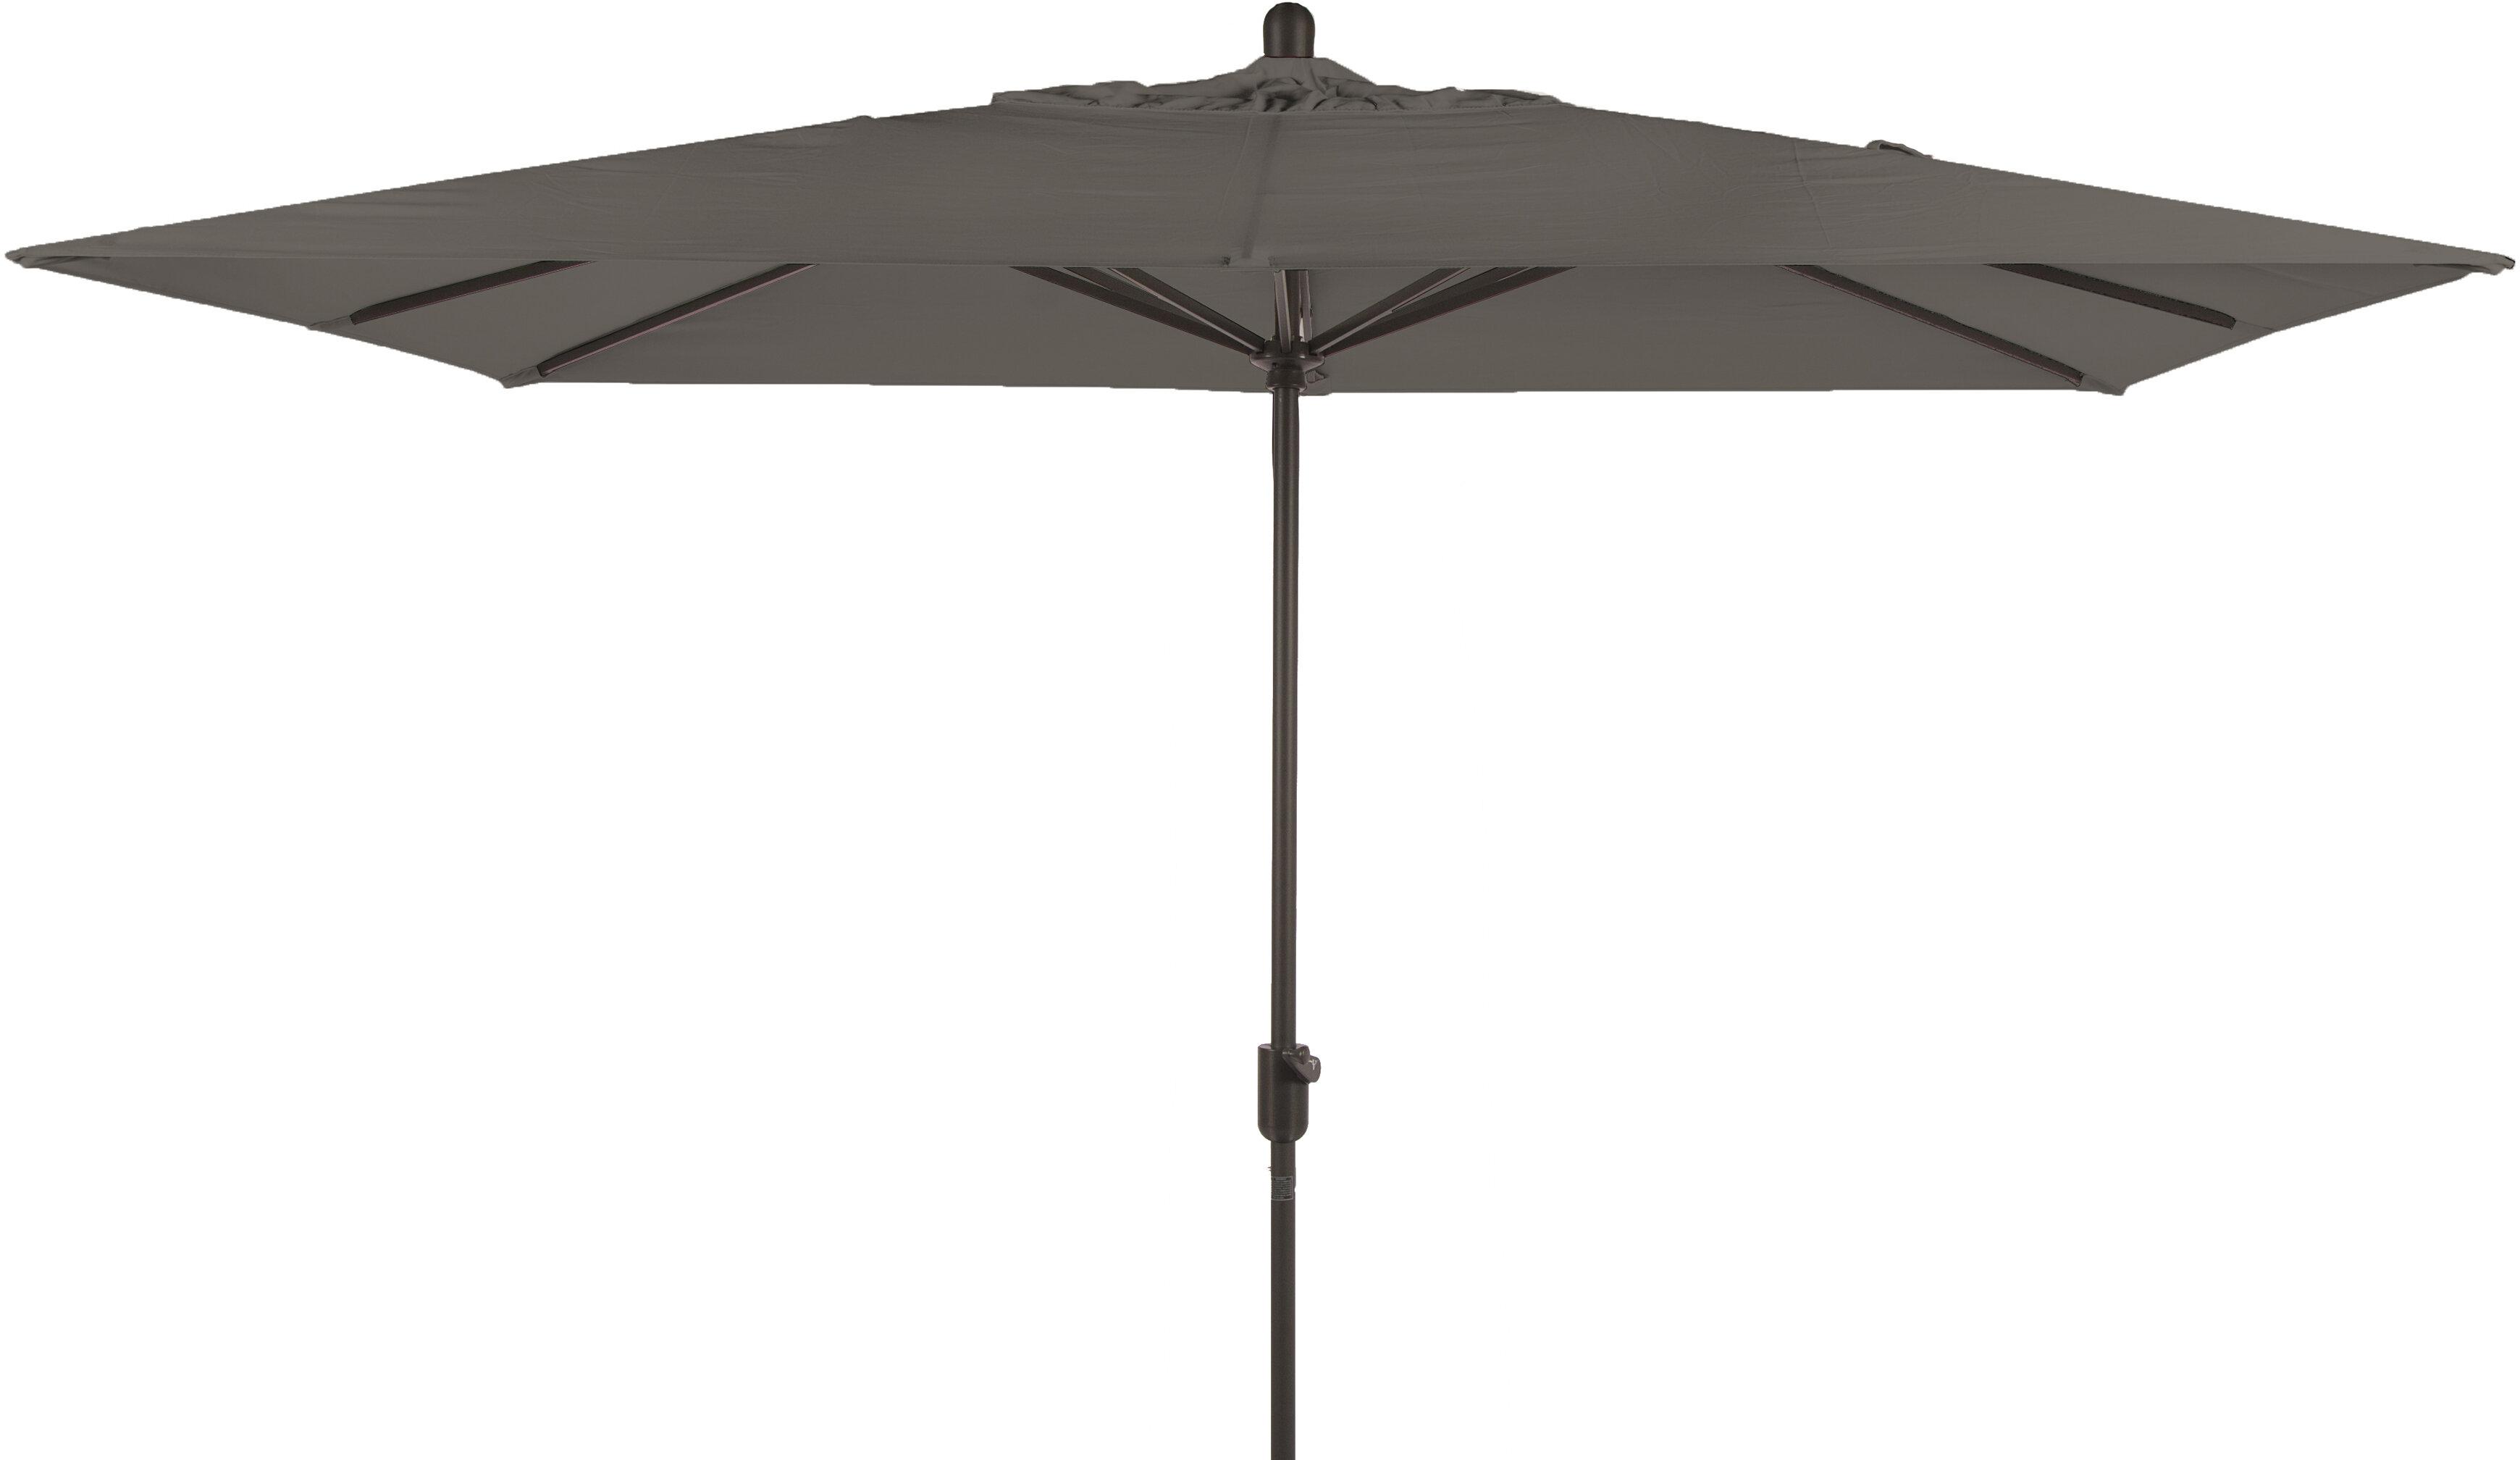 Genial Rectangular Sunbrella Patio Umbrellas Youu0027ll Love In 2019 ...